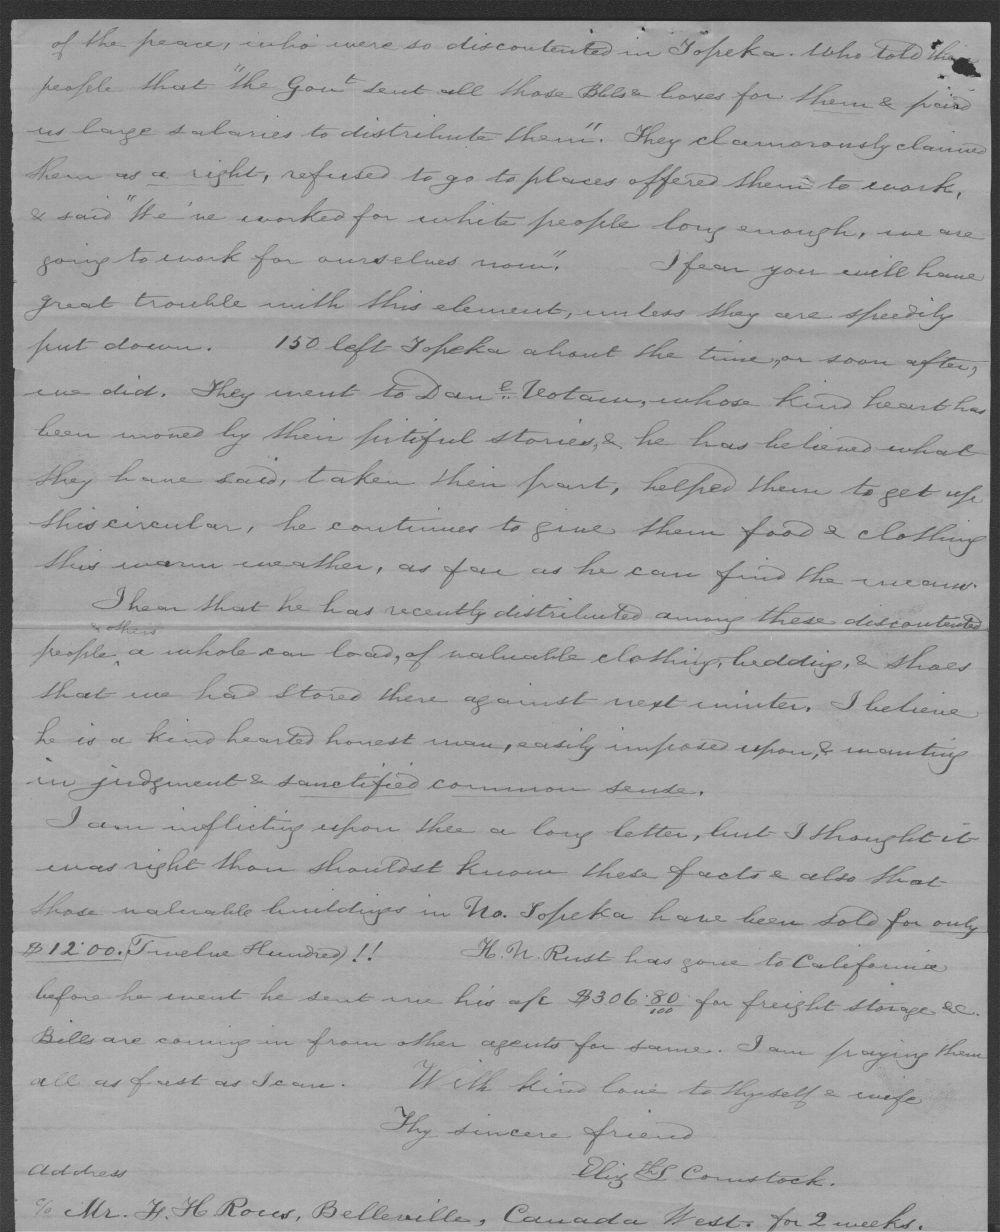 Elizabeth Comstock to John P. St. John - 4